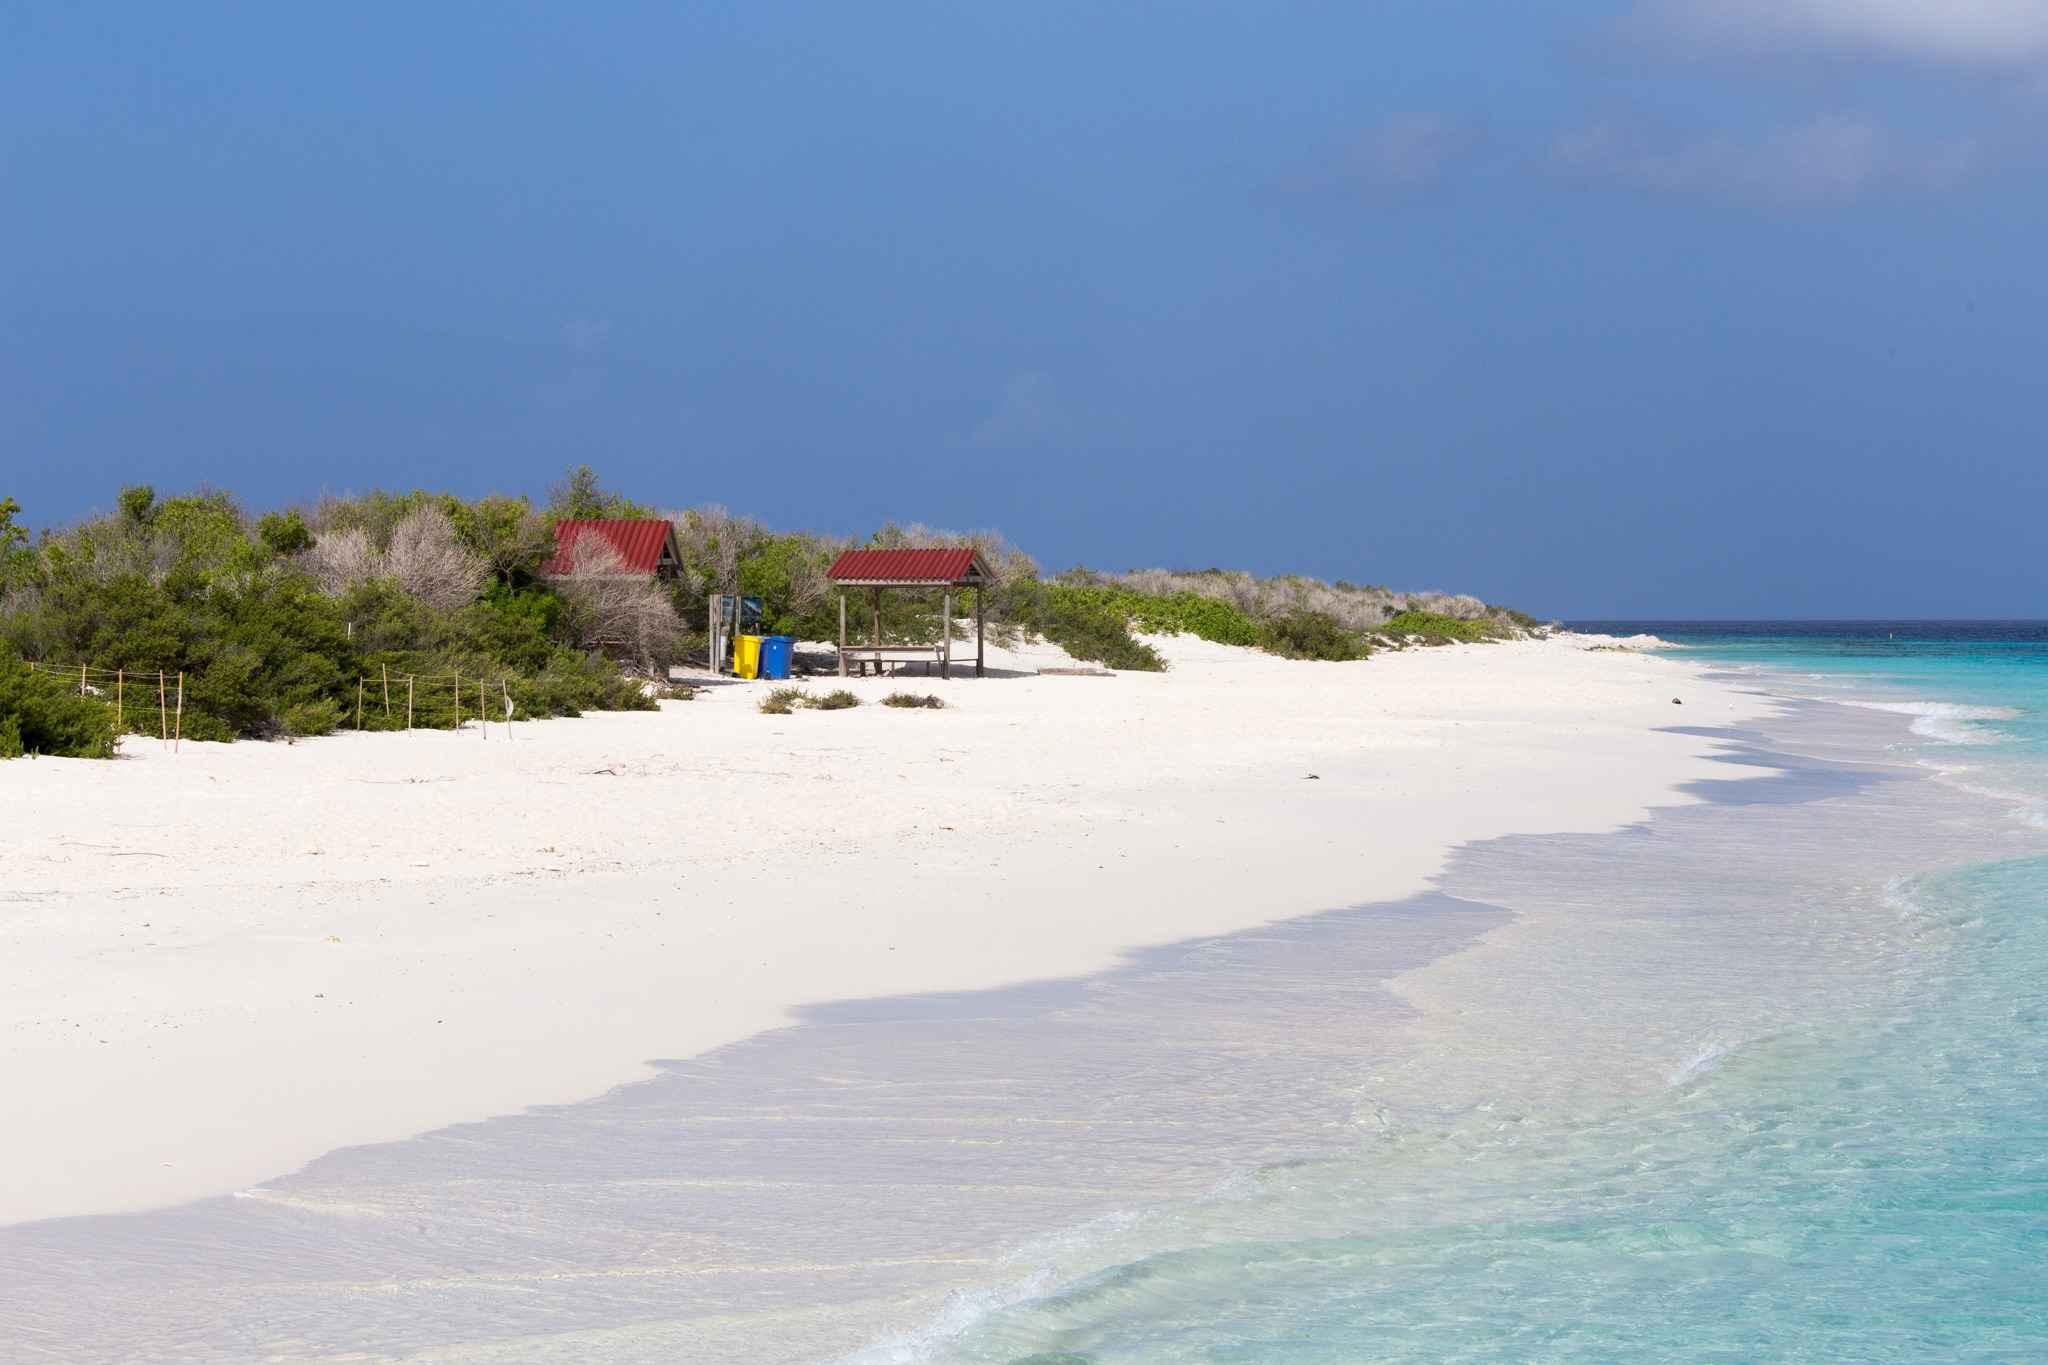 Bonaire luxe villa appartementen-klein Bonaire